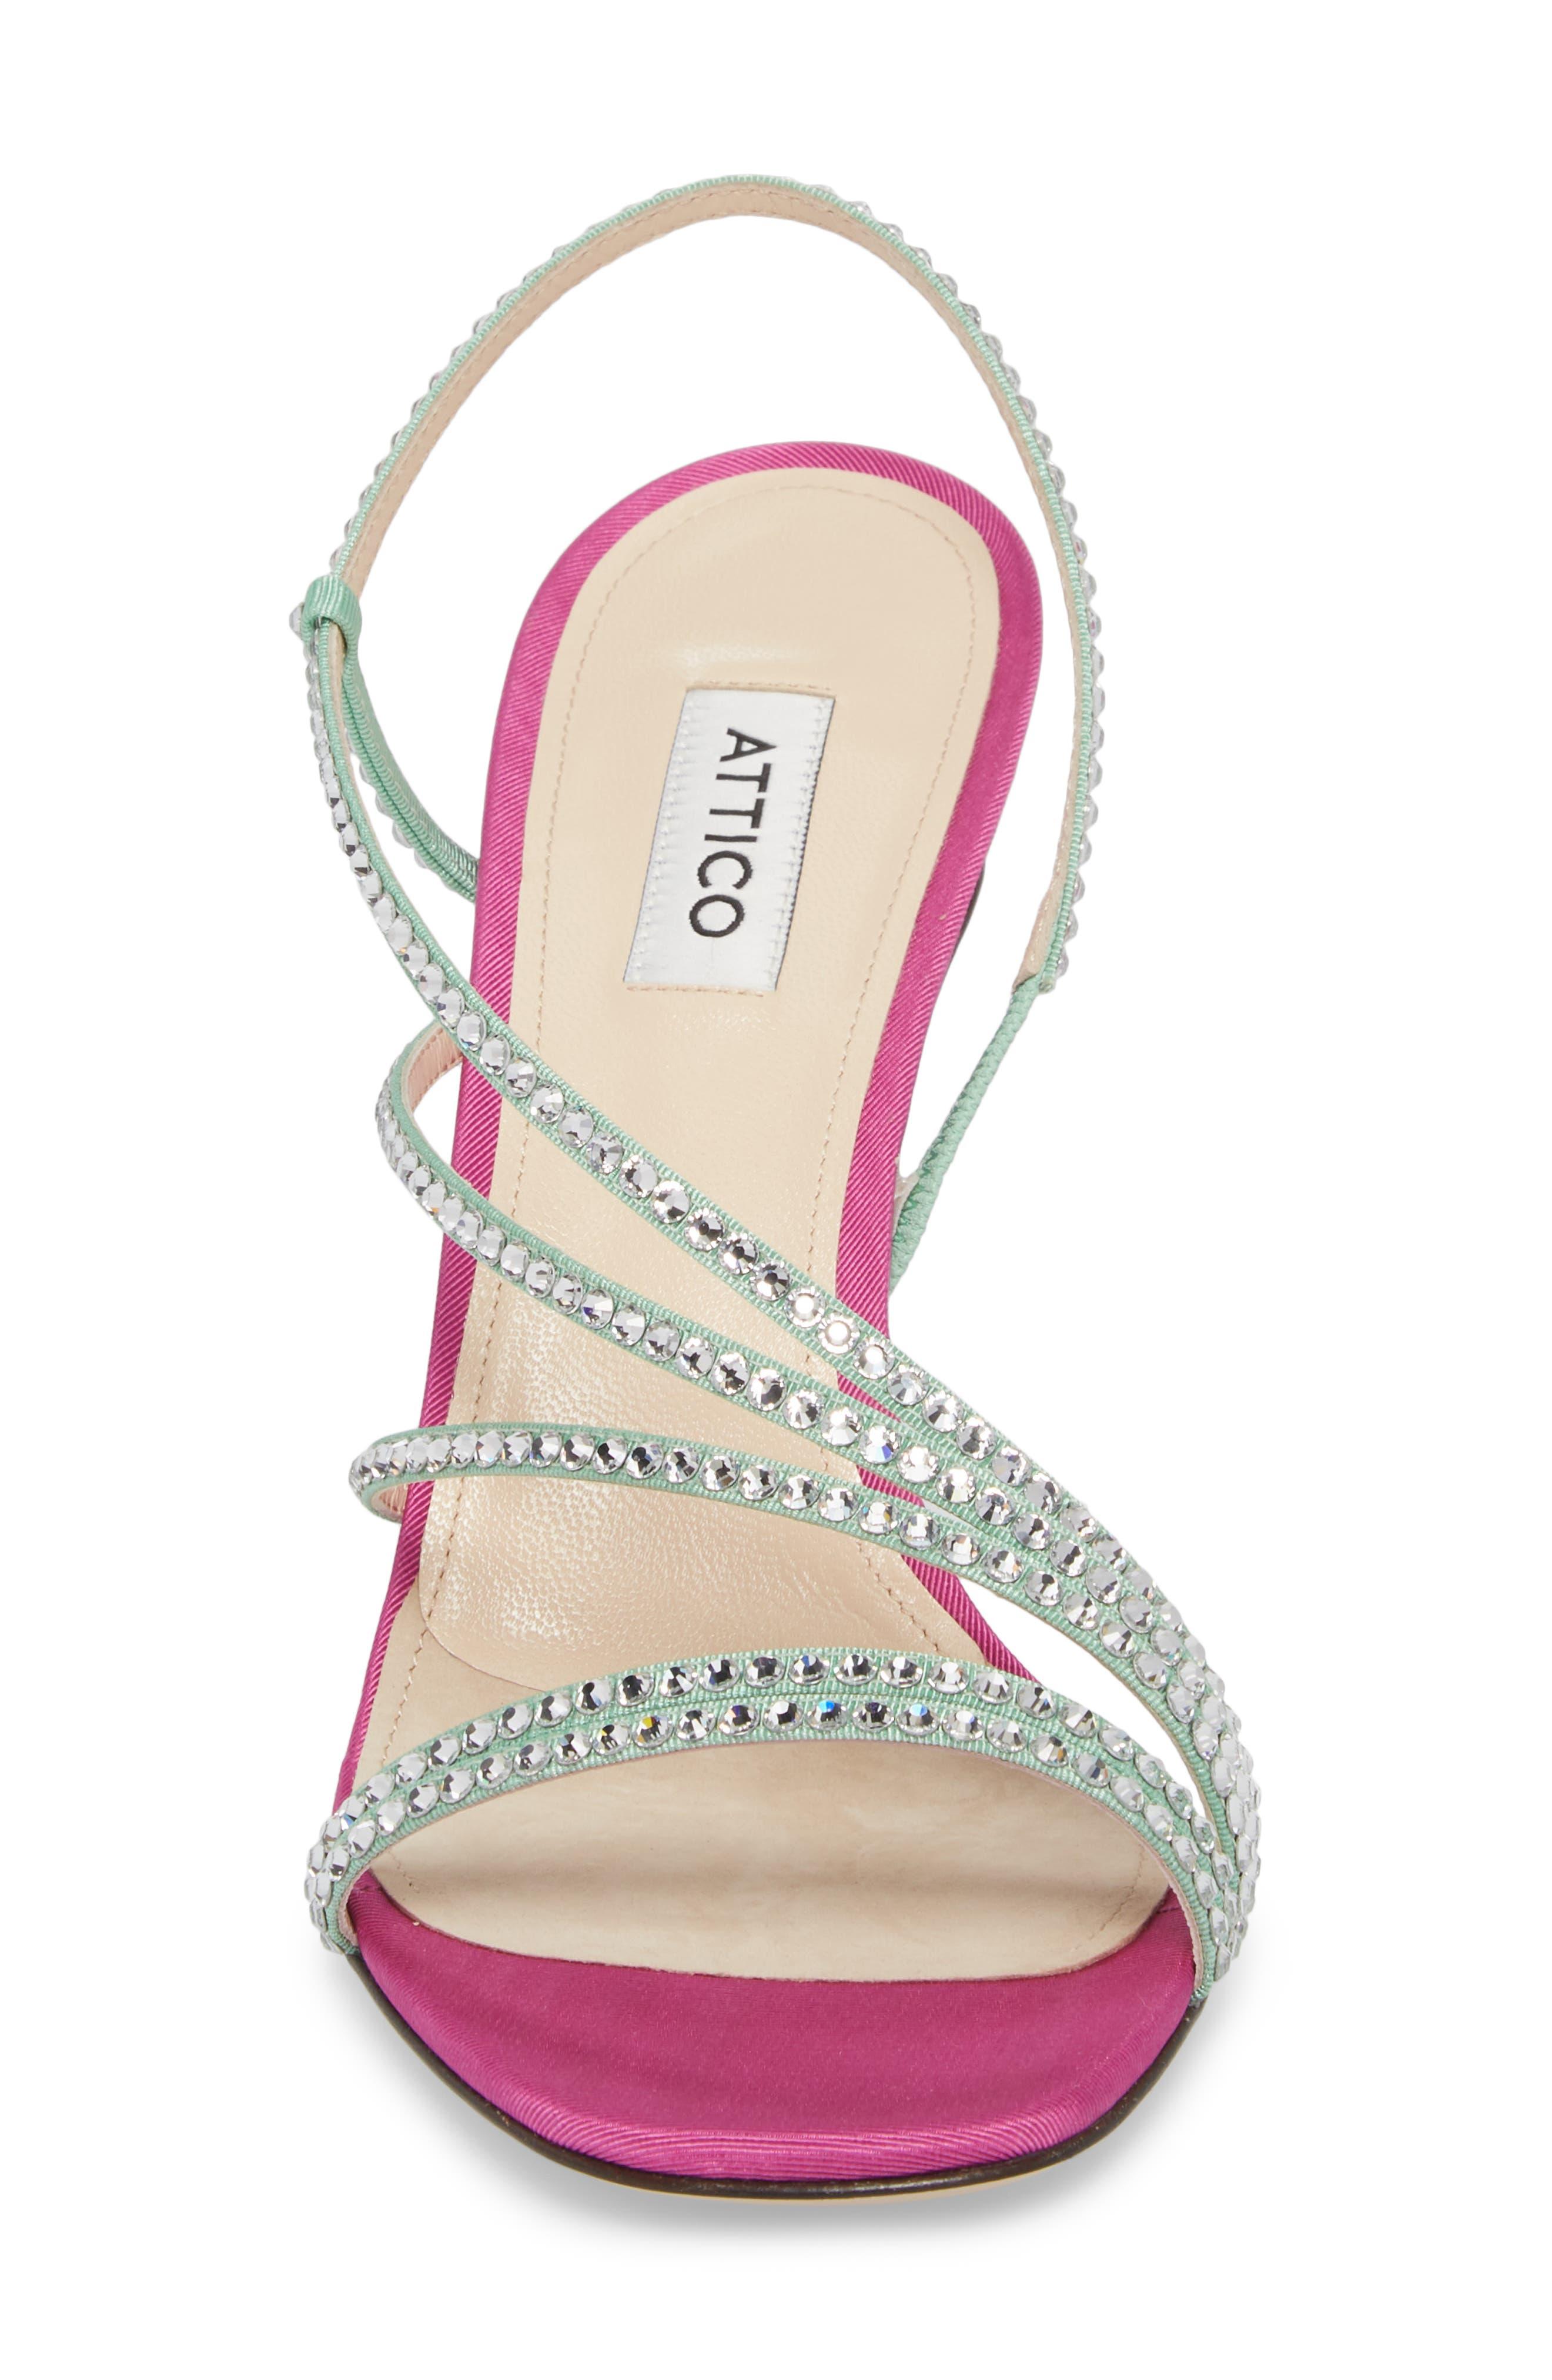 Crystal Embellished Strappy Sandal,                             Alternate thumbnail 4, color,                             Pink/ Silver